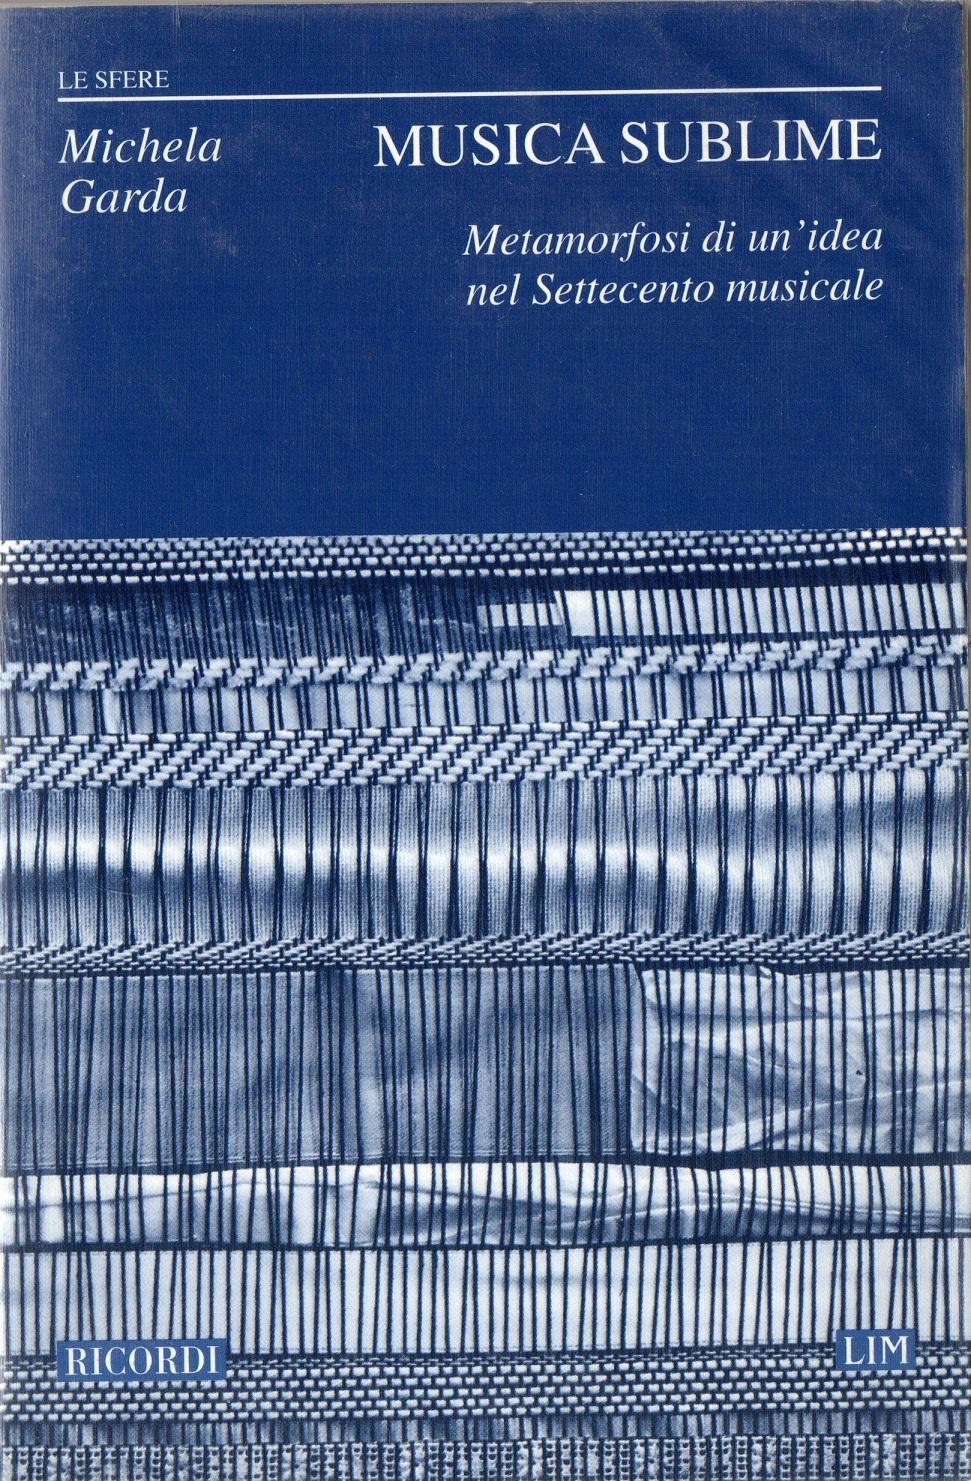 Musica sublime